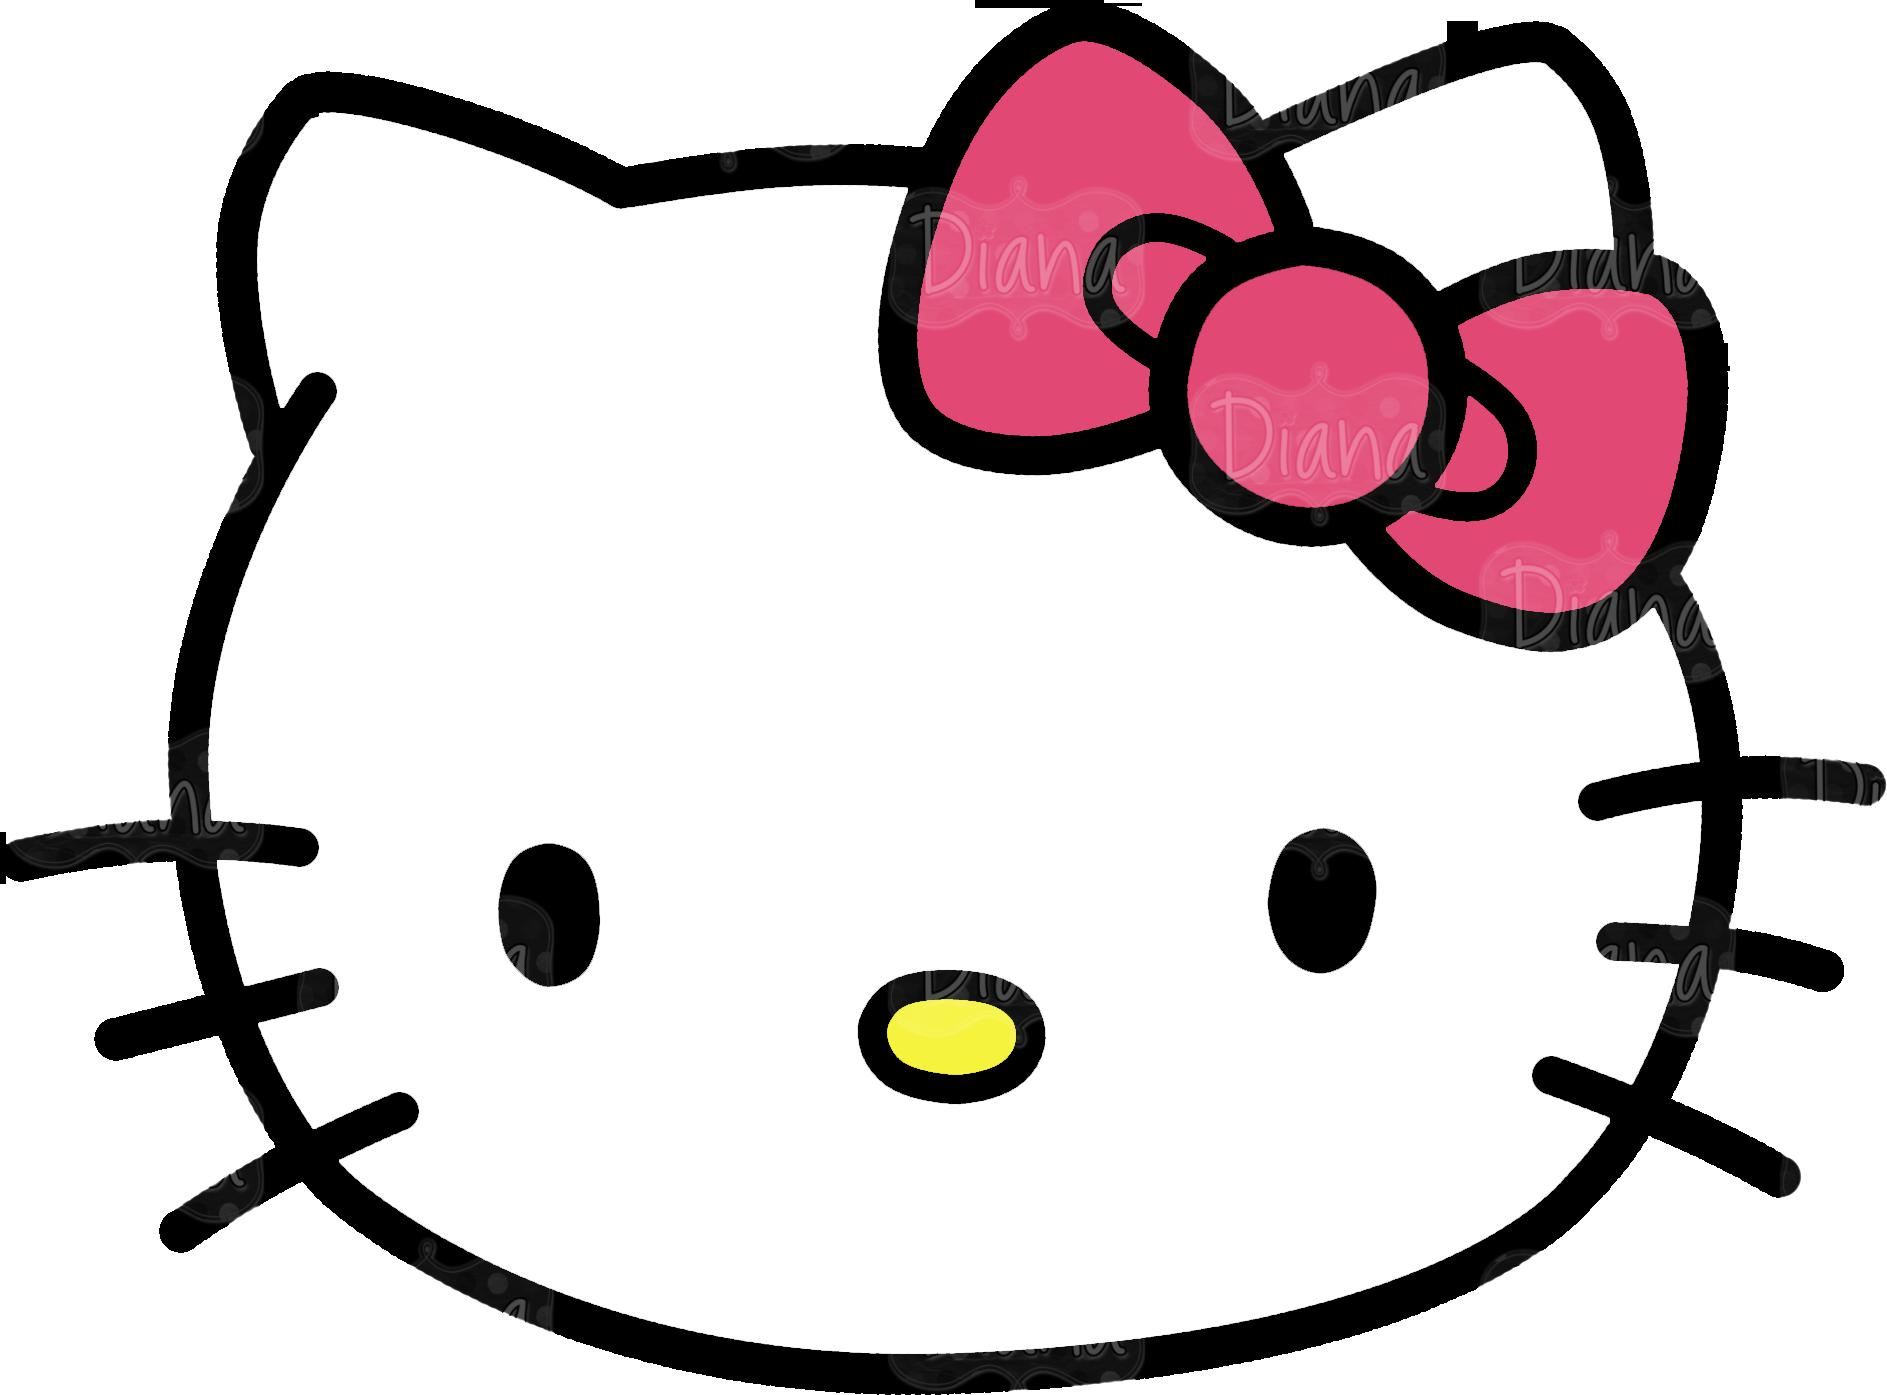 Hello Kitty Head Clip Art Posts Totales 1536 Puntos Premio 0 Inscrito 10 24 2010 Estatus Hello Kitty Tattoos Hello Kitty Printables Hello Kitty Coloring